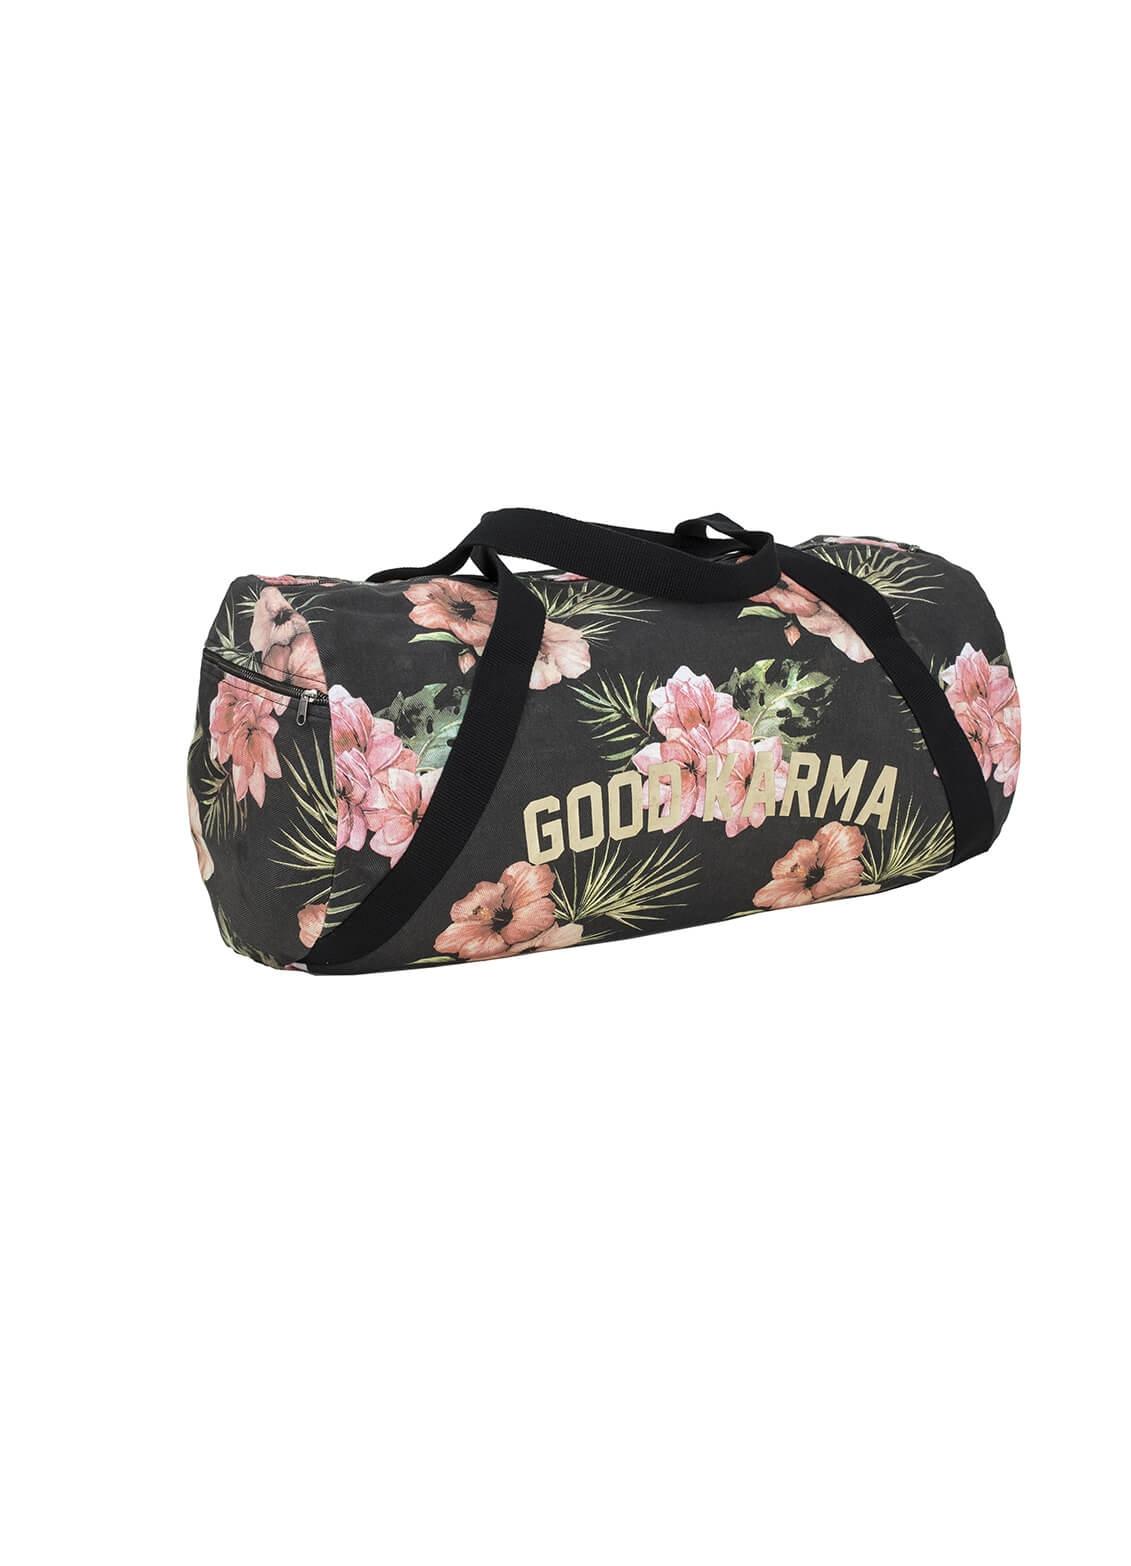 Spiritual Gangster Good karma duffle bag thumbnail